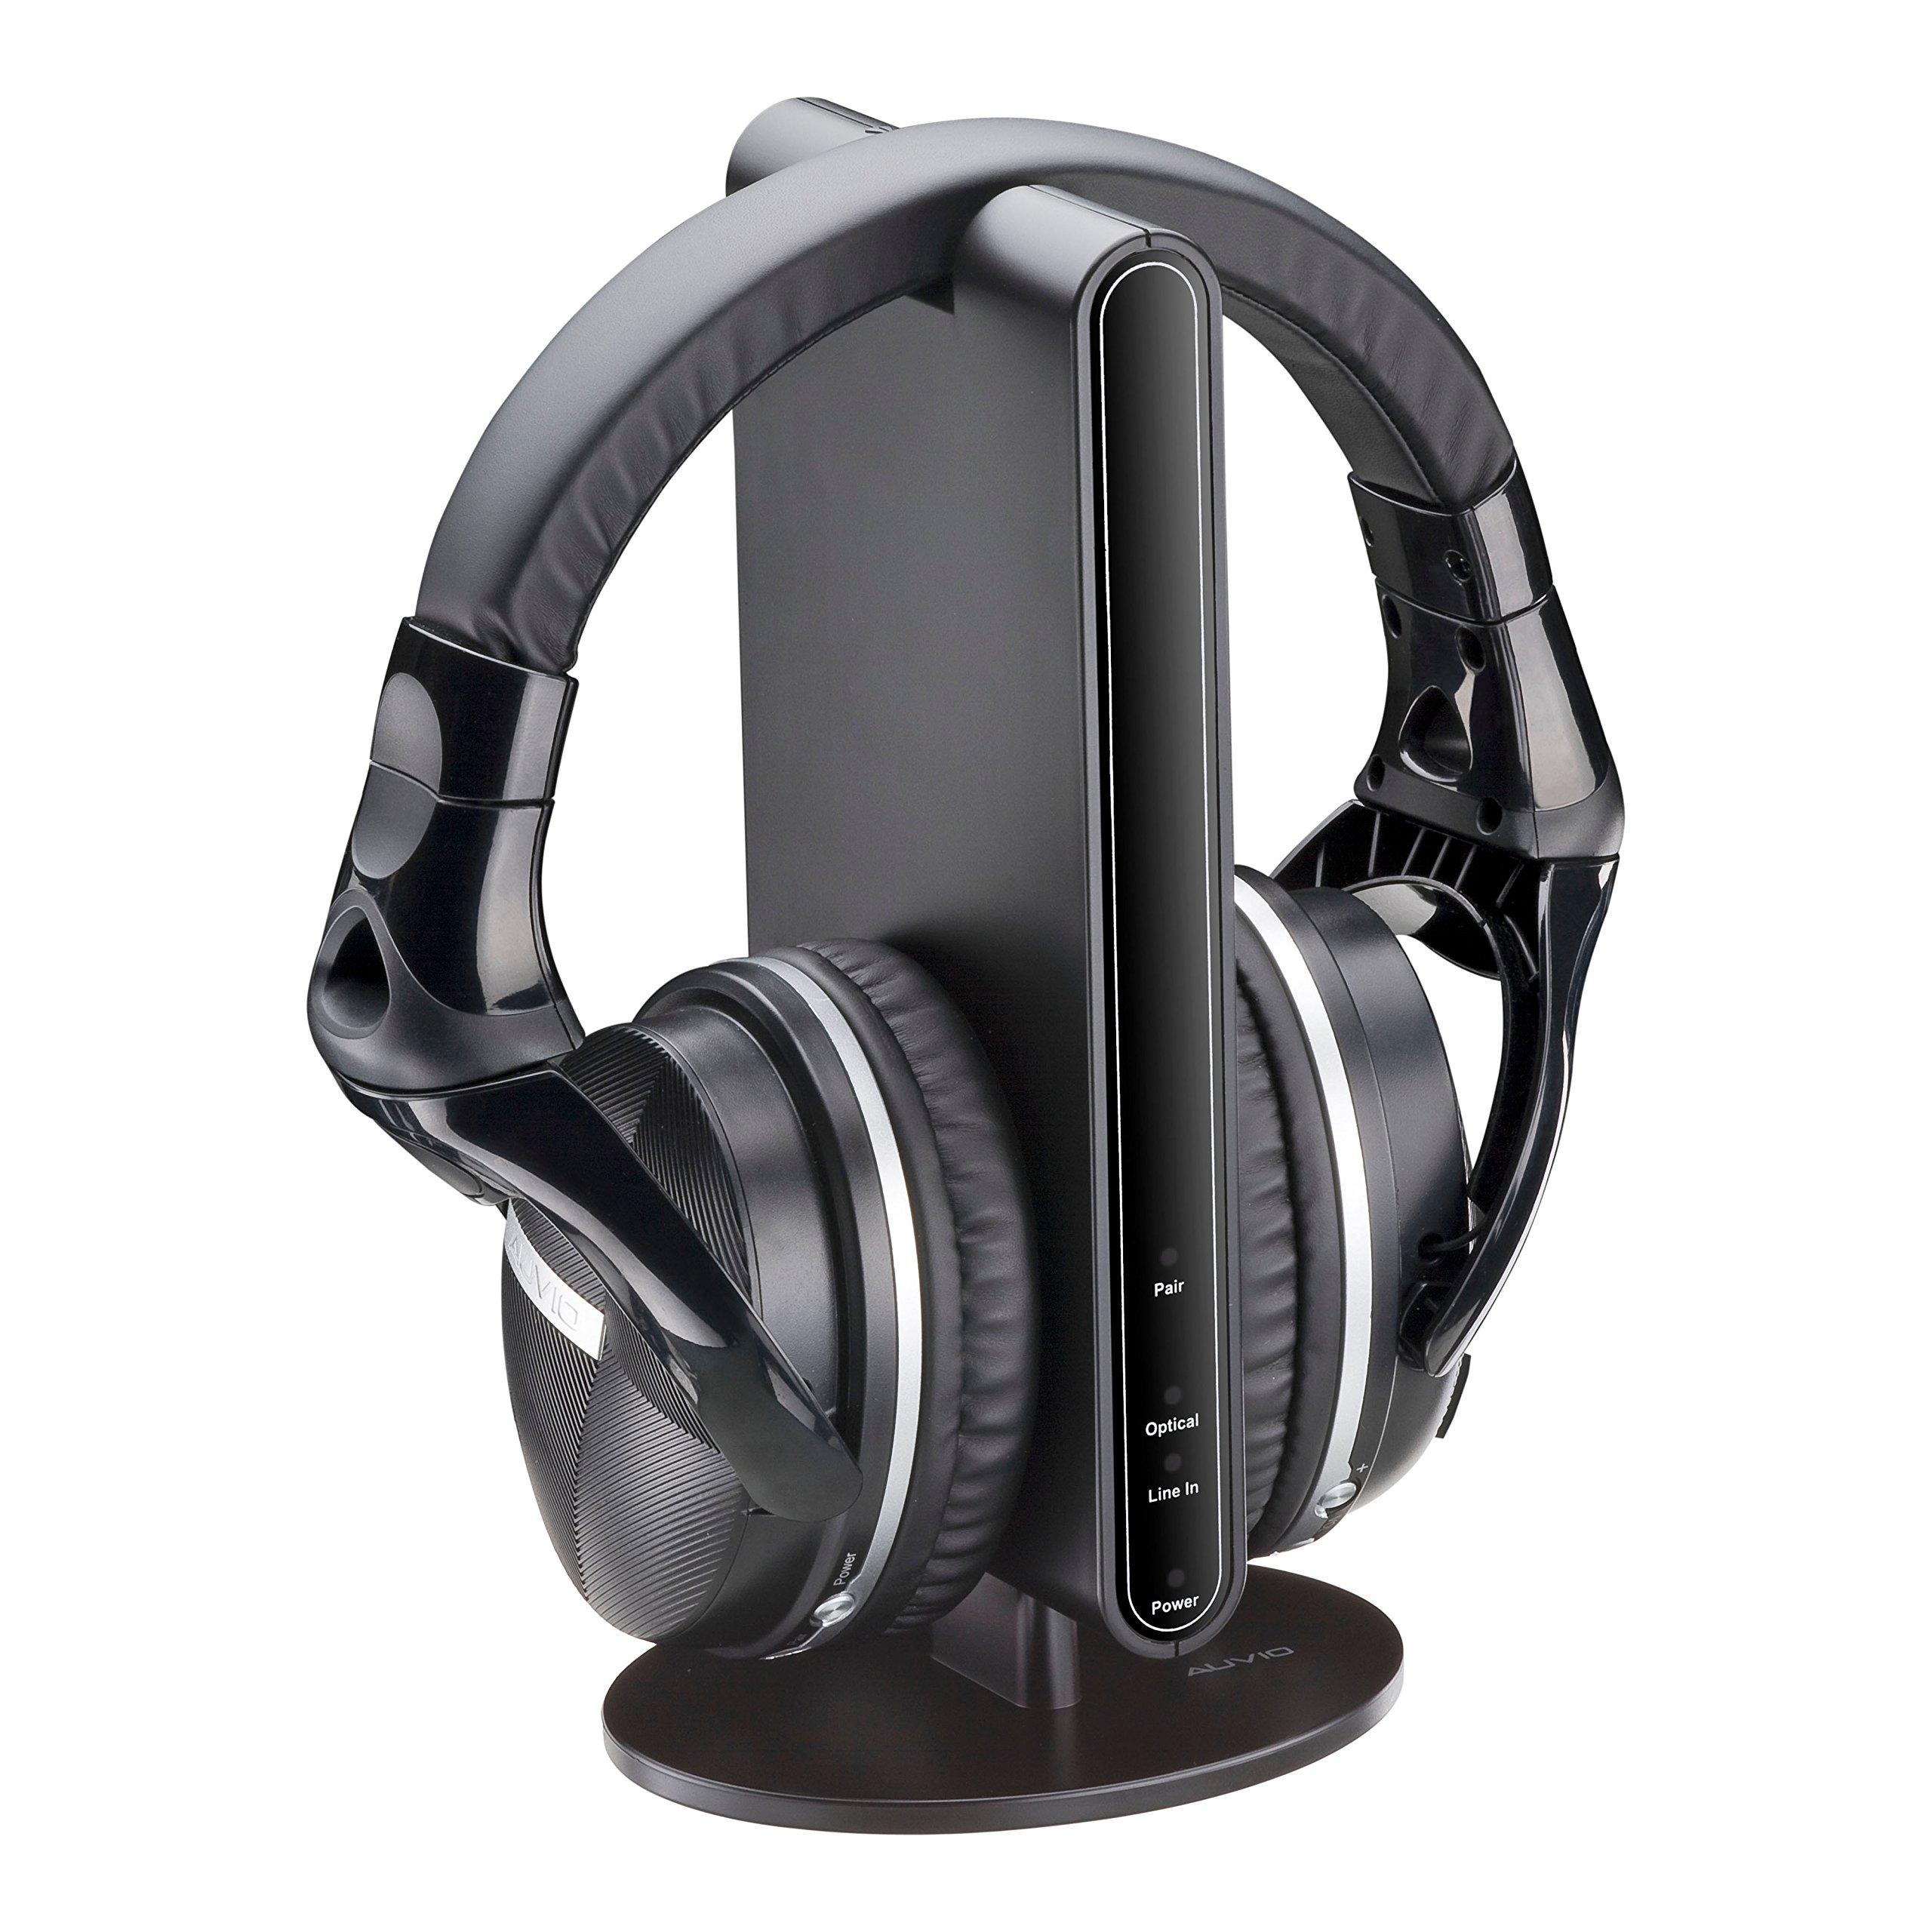 Auvio Wireless Stereo Headphones For Tv Buy Online In Bahamas At Desertcart